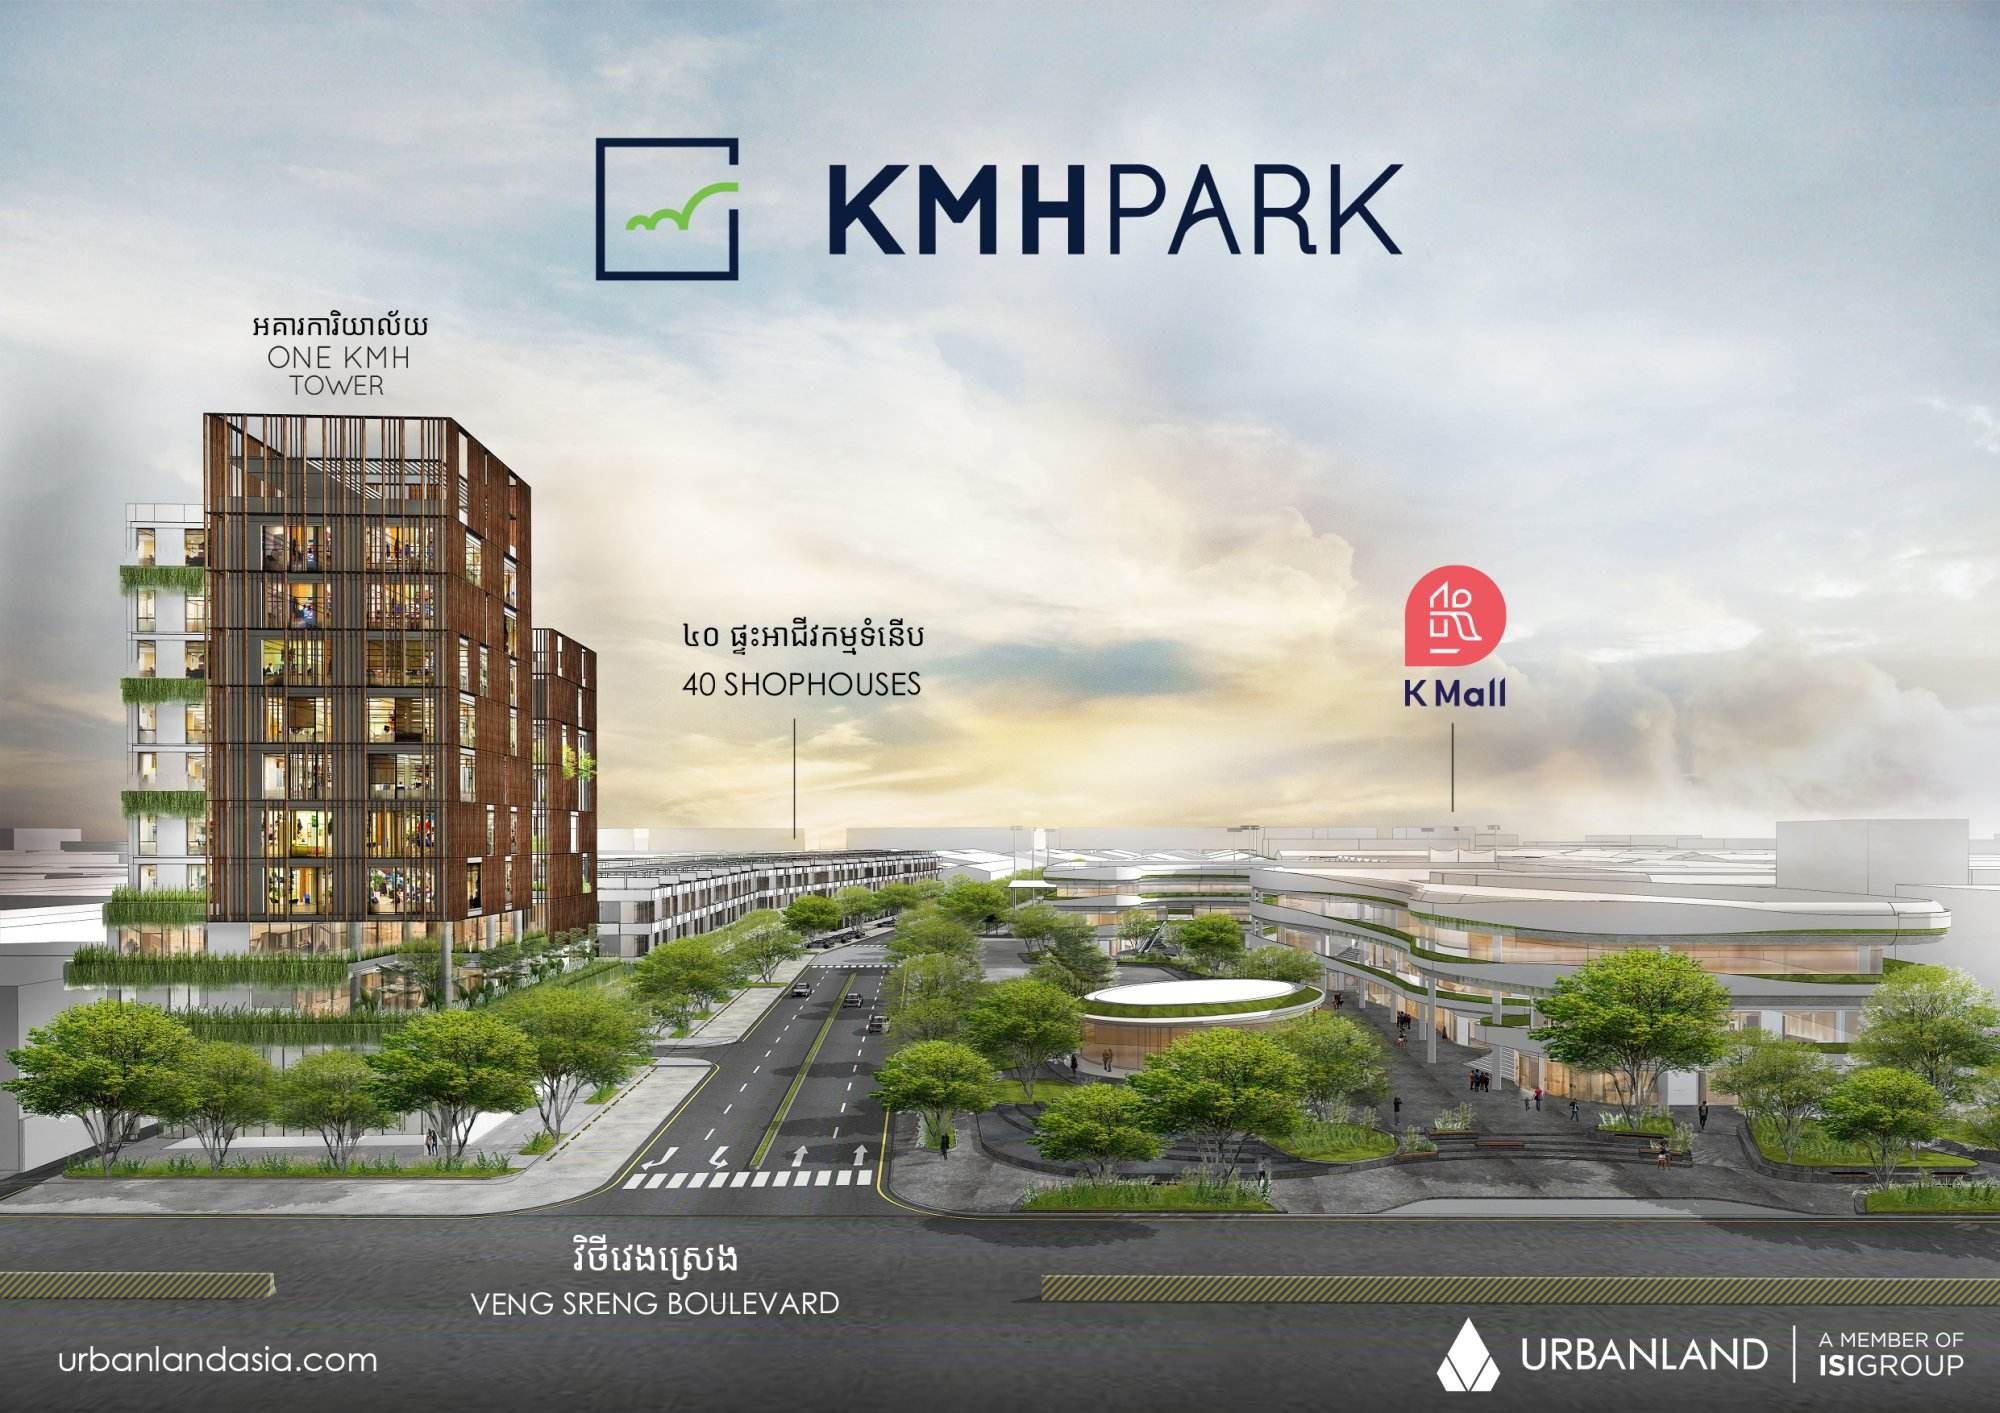 KMH-Park-masterplan, Shophouse and Mall